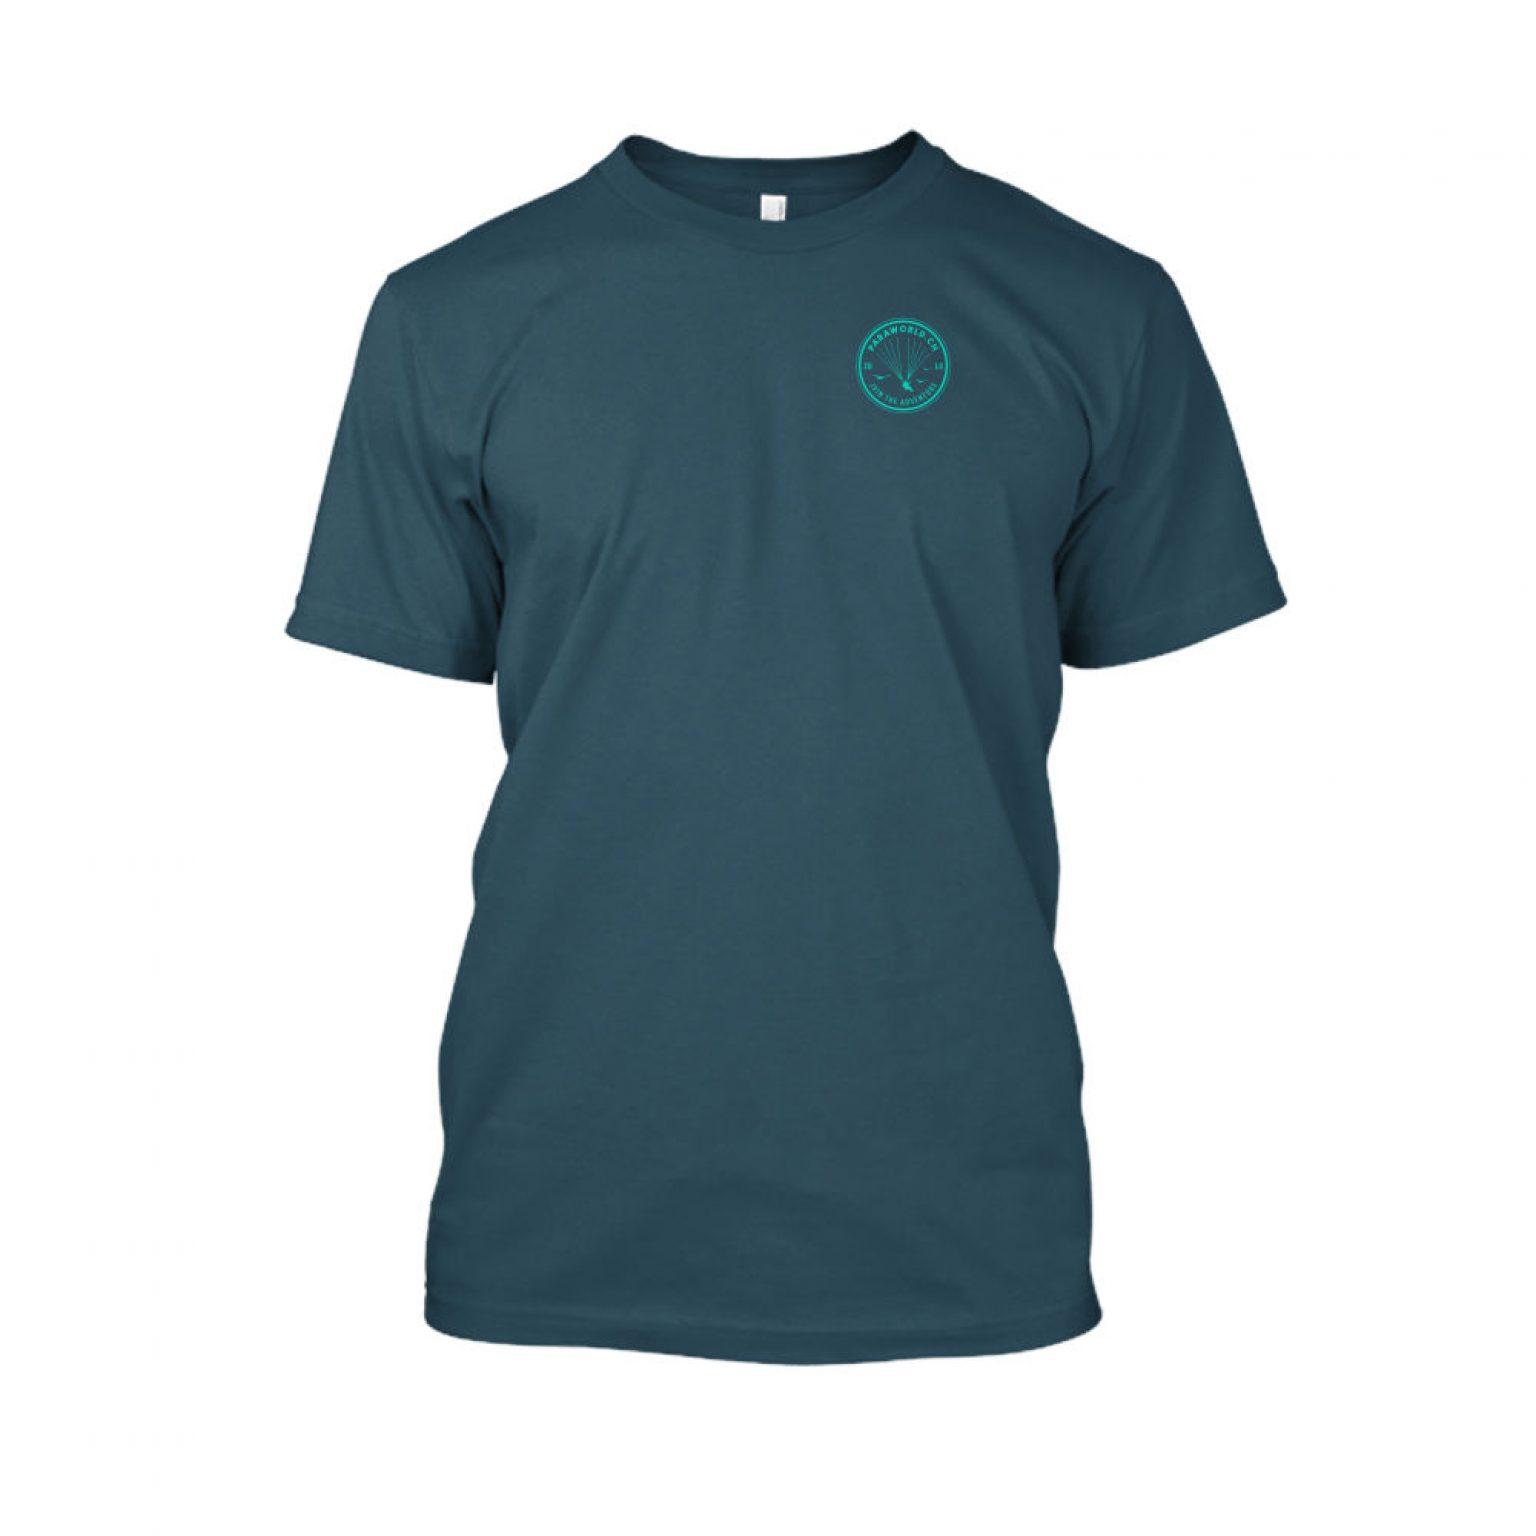 JTA s turqois shirt herren navy front